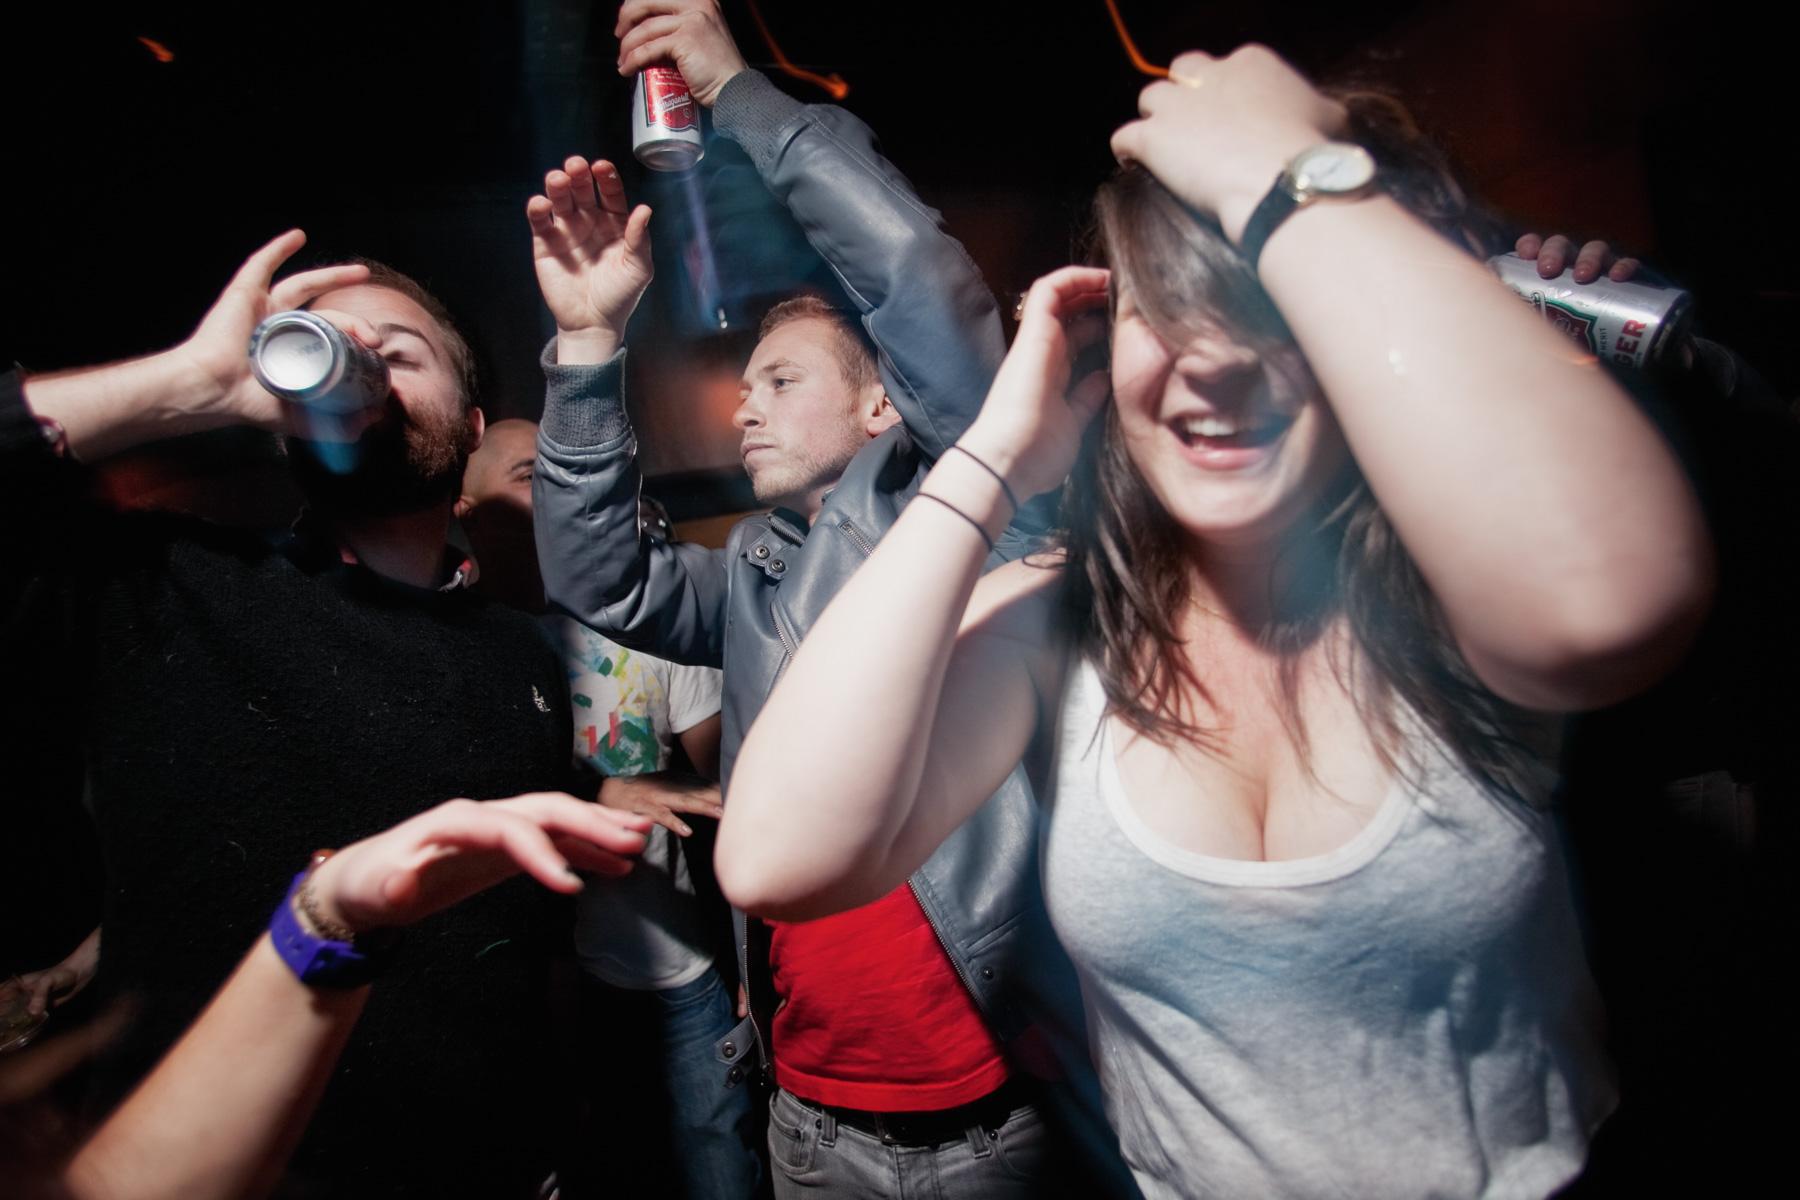 dance-drink-bar-1.jpg